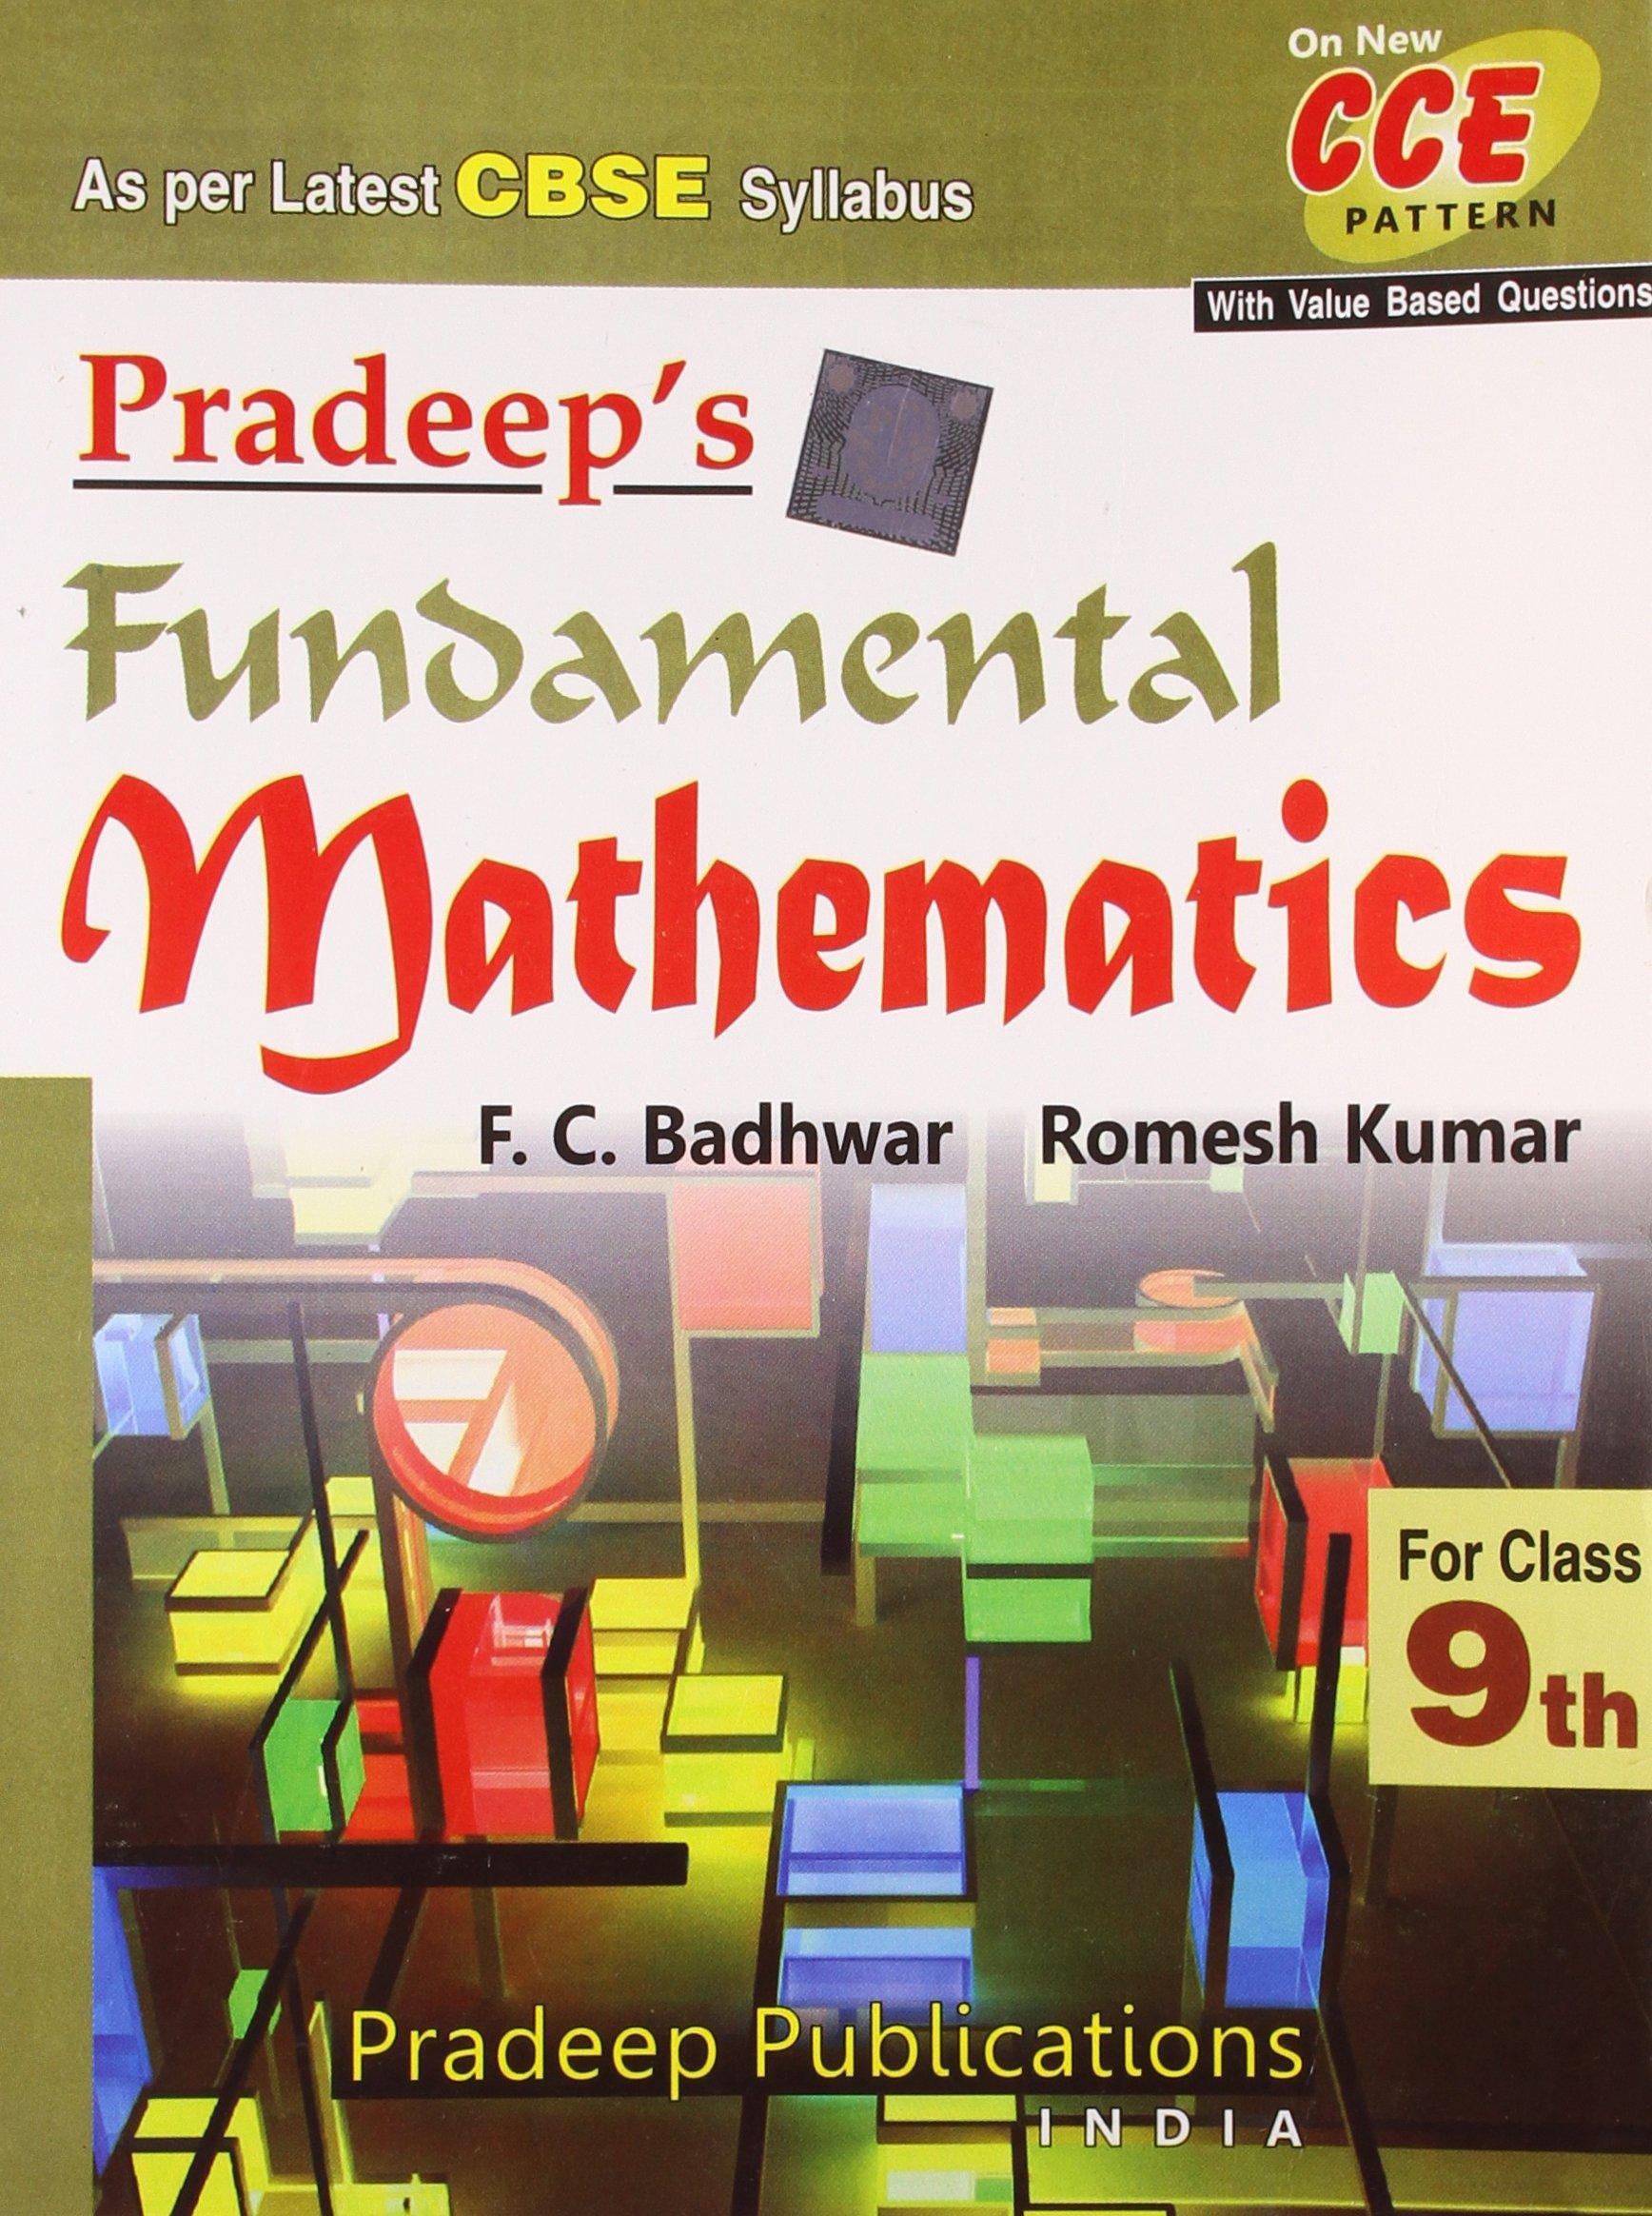 Pradeep's Fundamental Mathematics - Class IX As per Latest CBSE Syllabus:  Amazon.in: F.C. Badhwar, Romesh Kumar: Books